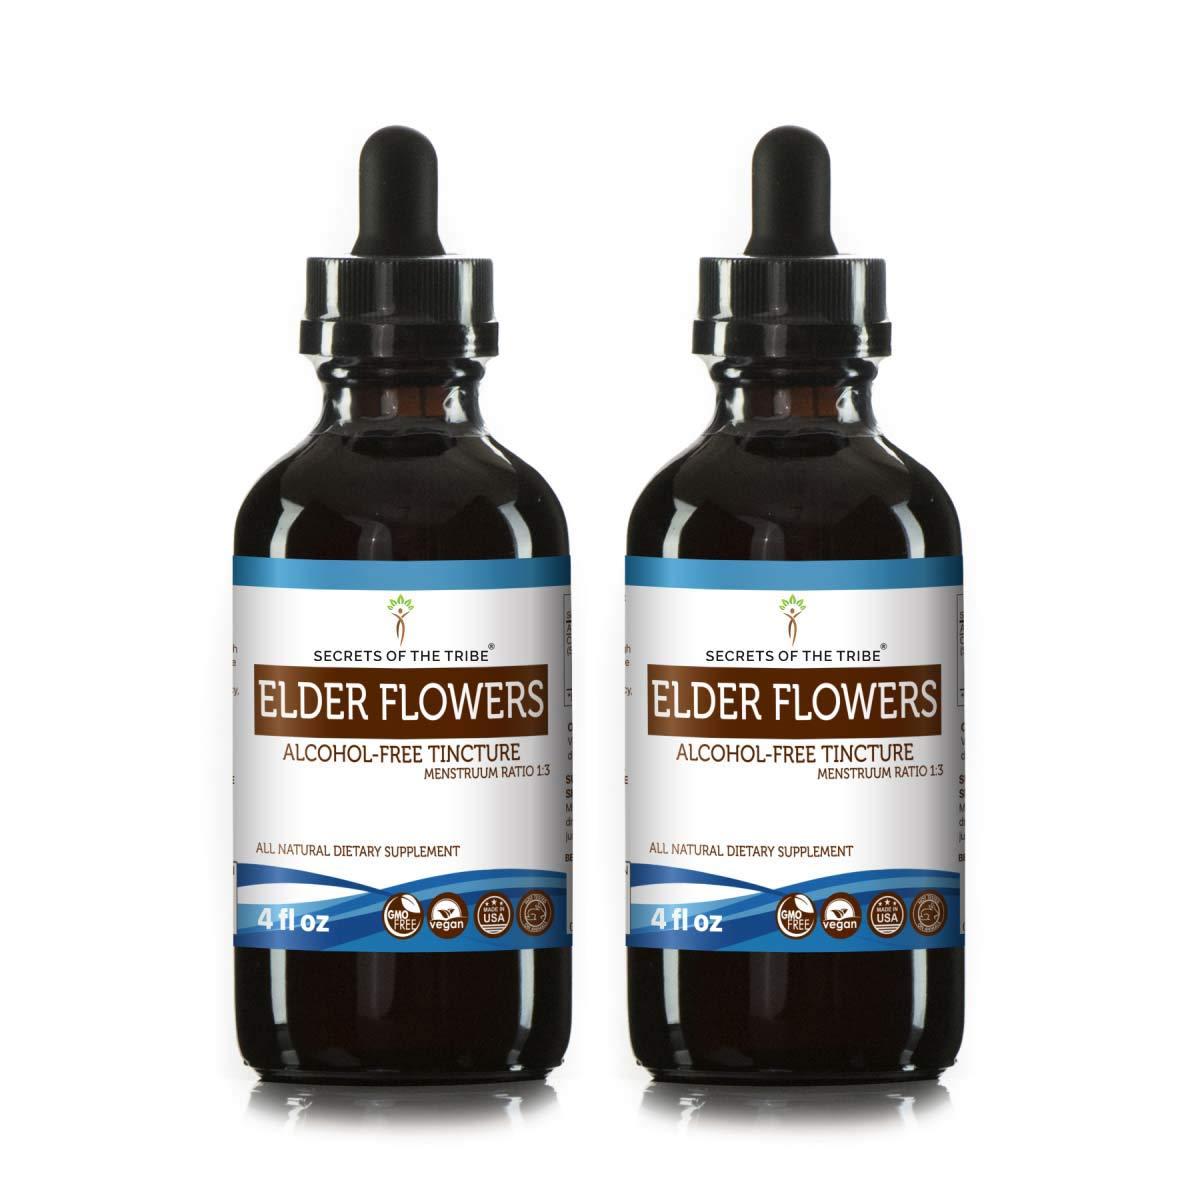 Elder Flowers Alcohol-Free Tincture Liquid Extract, Organic Elder Flowers (Sambucus Nigra) Dried Flowers (2x4 fl oz)